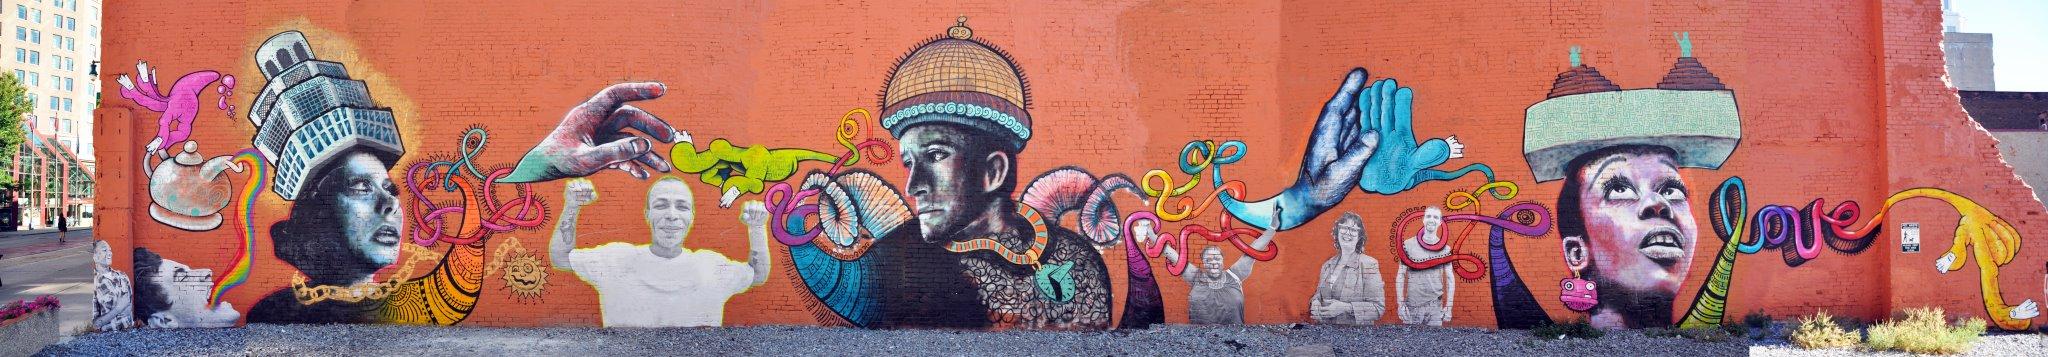 Around buffalowe graffiti art mural by chuck tingley for Bufflon revetement mural